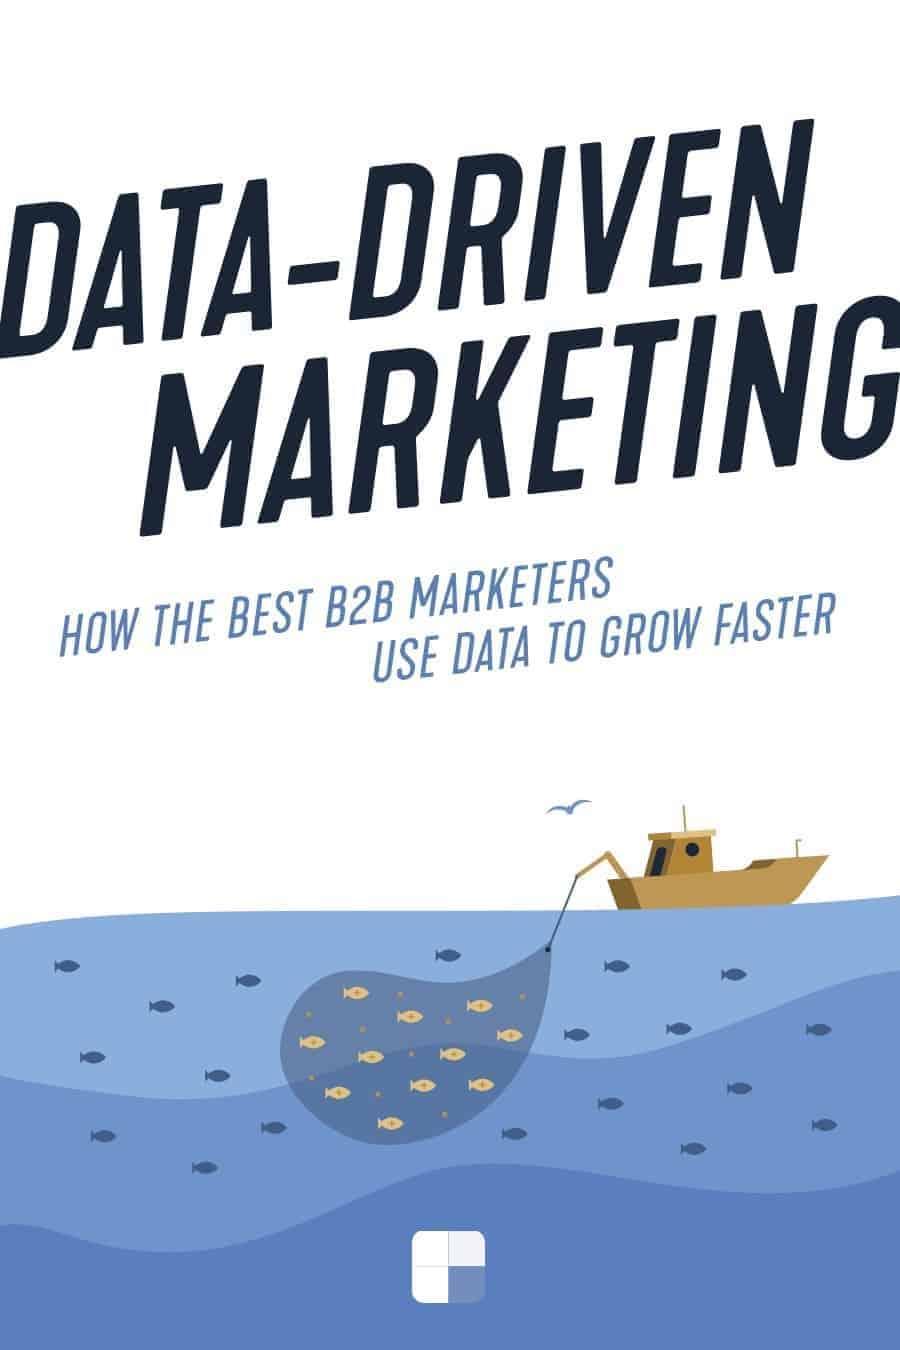 data driven marketing free ebook, free ebook example